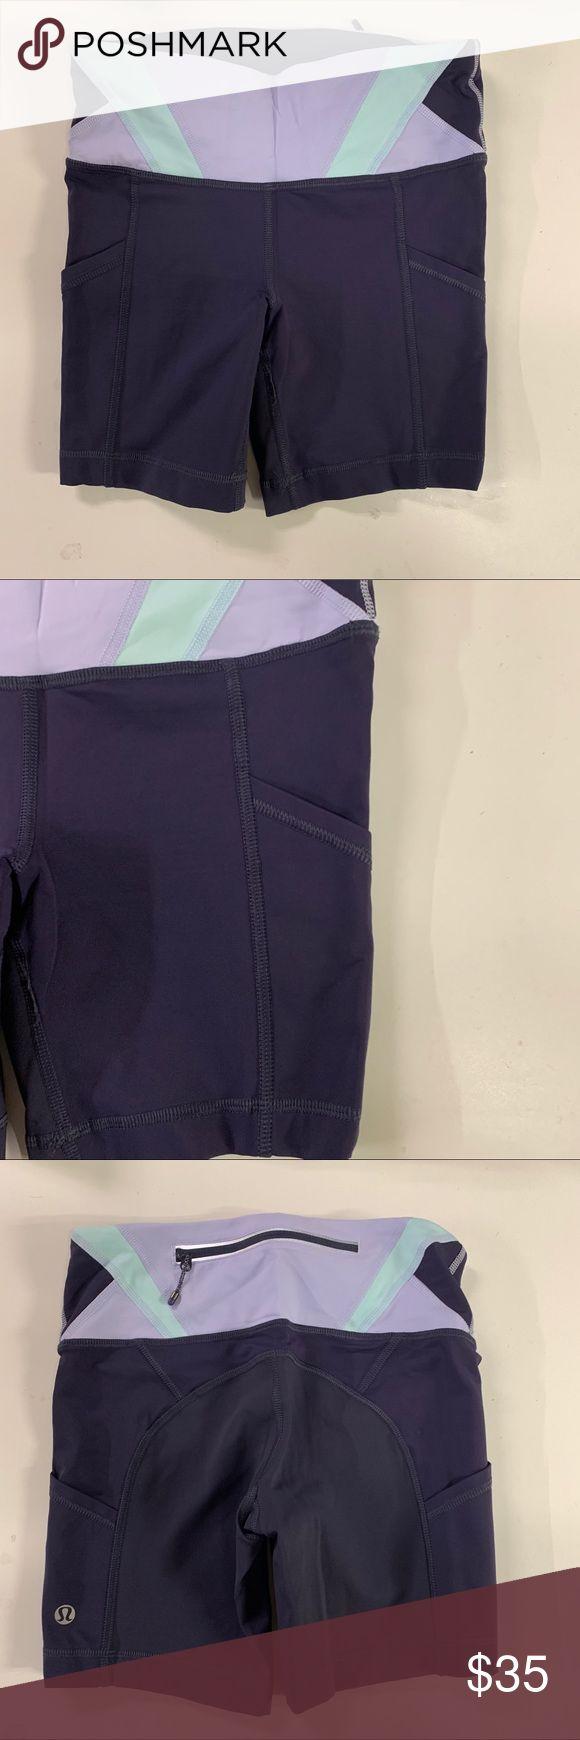 Lululemon Purple Biker Shorts Used like new. No noticeable flaws. Side pockets. …   – My Posh Picks